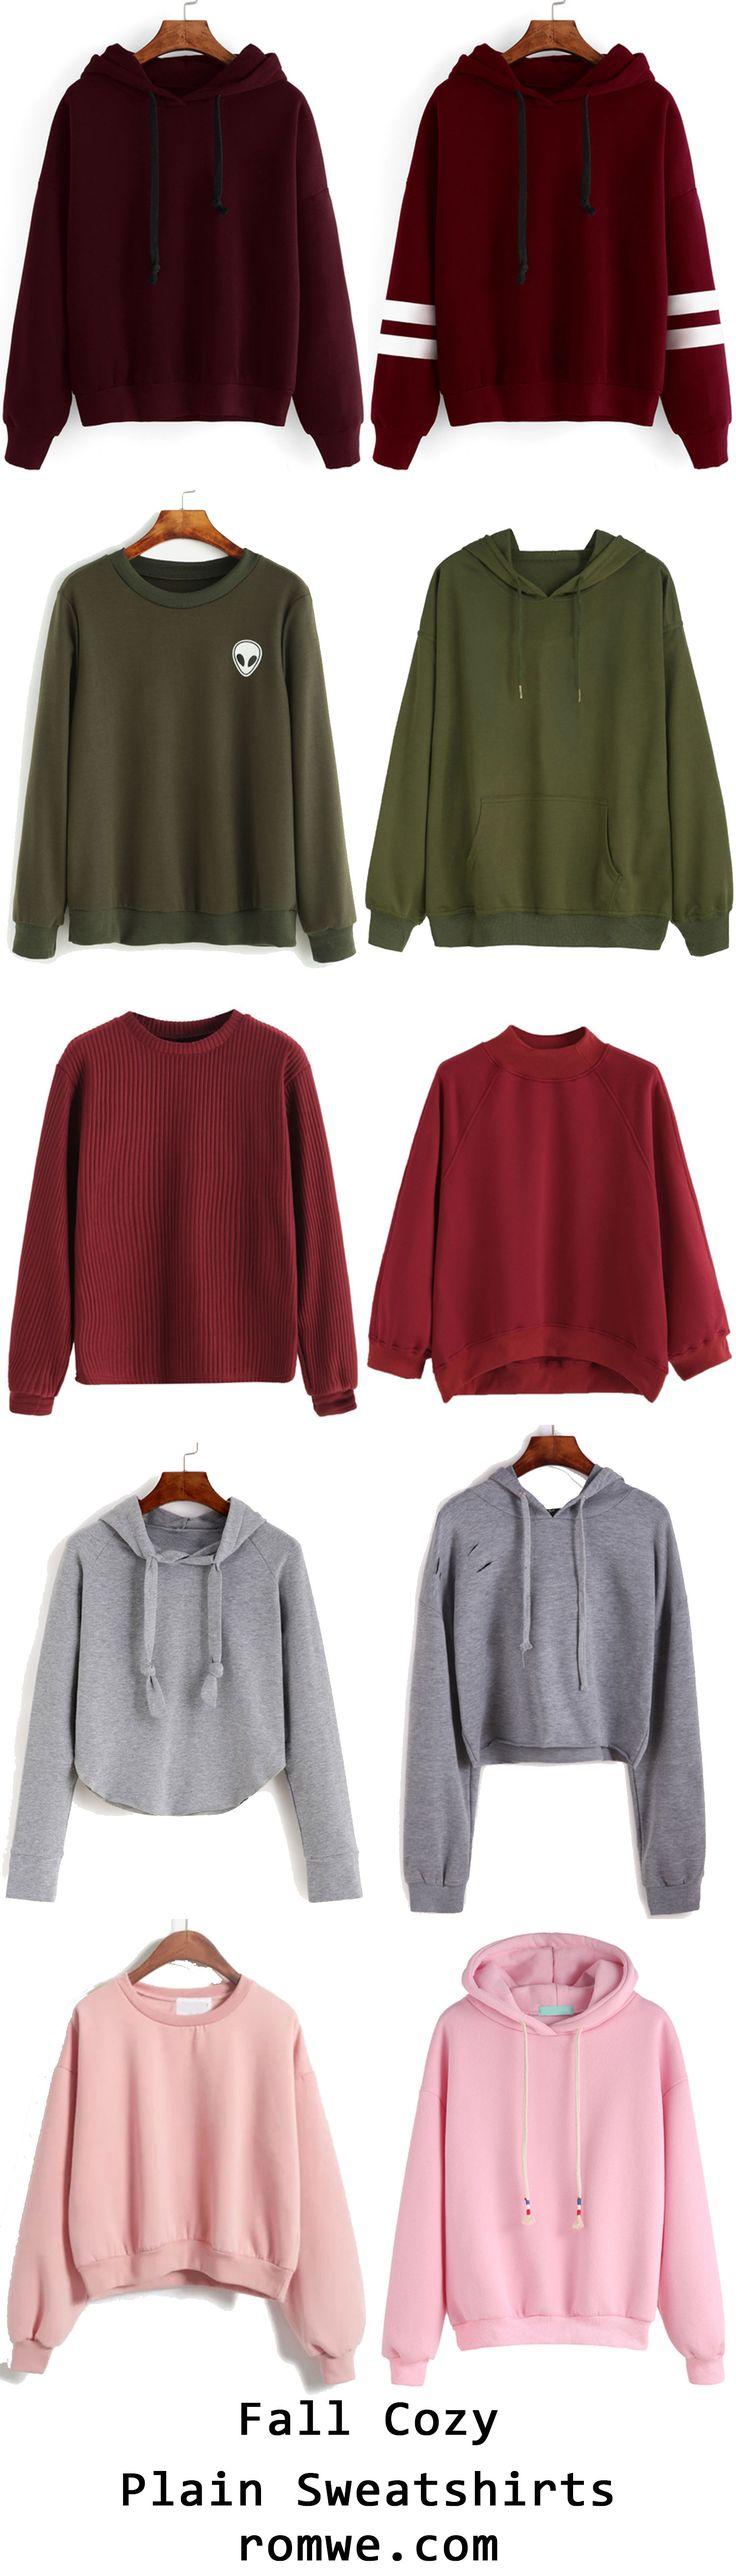 Cool Plain Sweatshirts from romwe.com